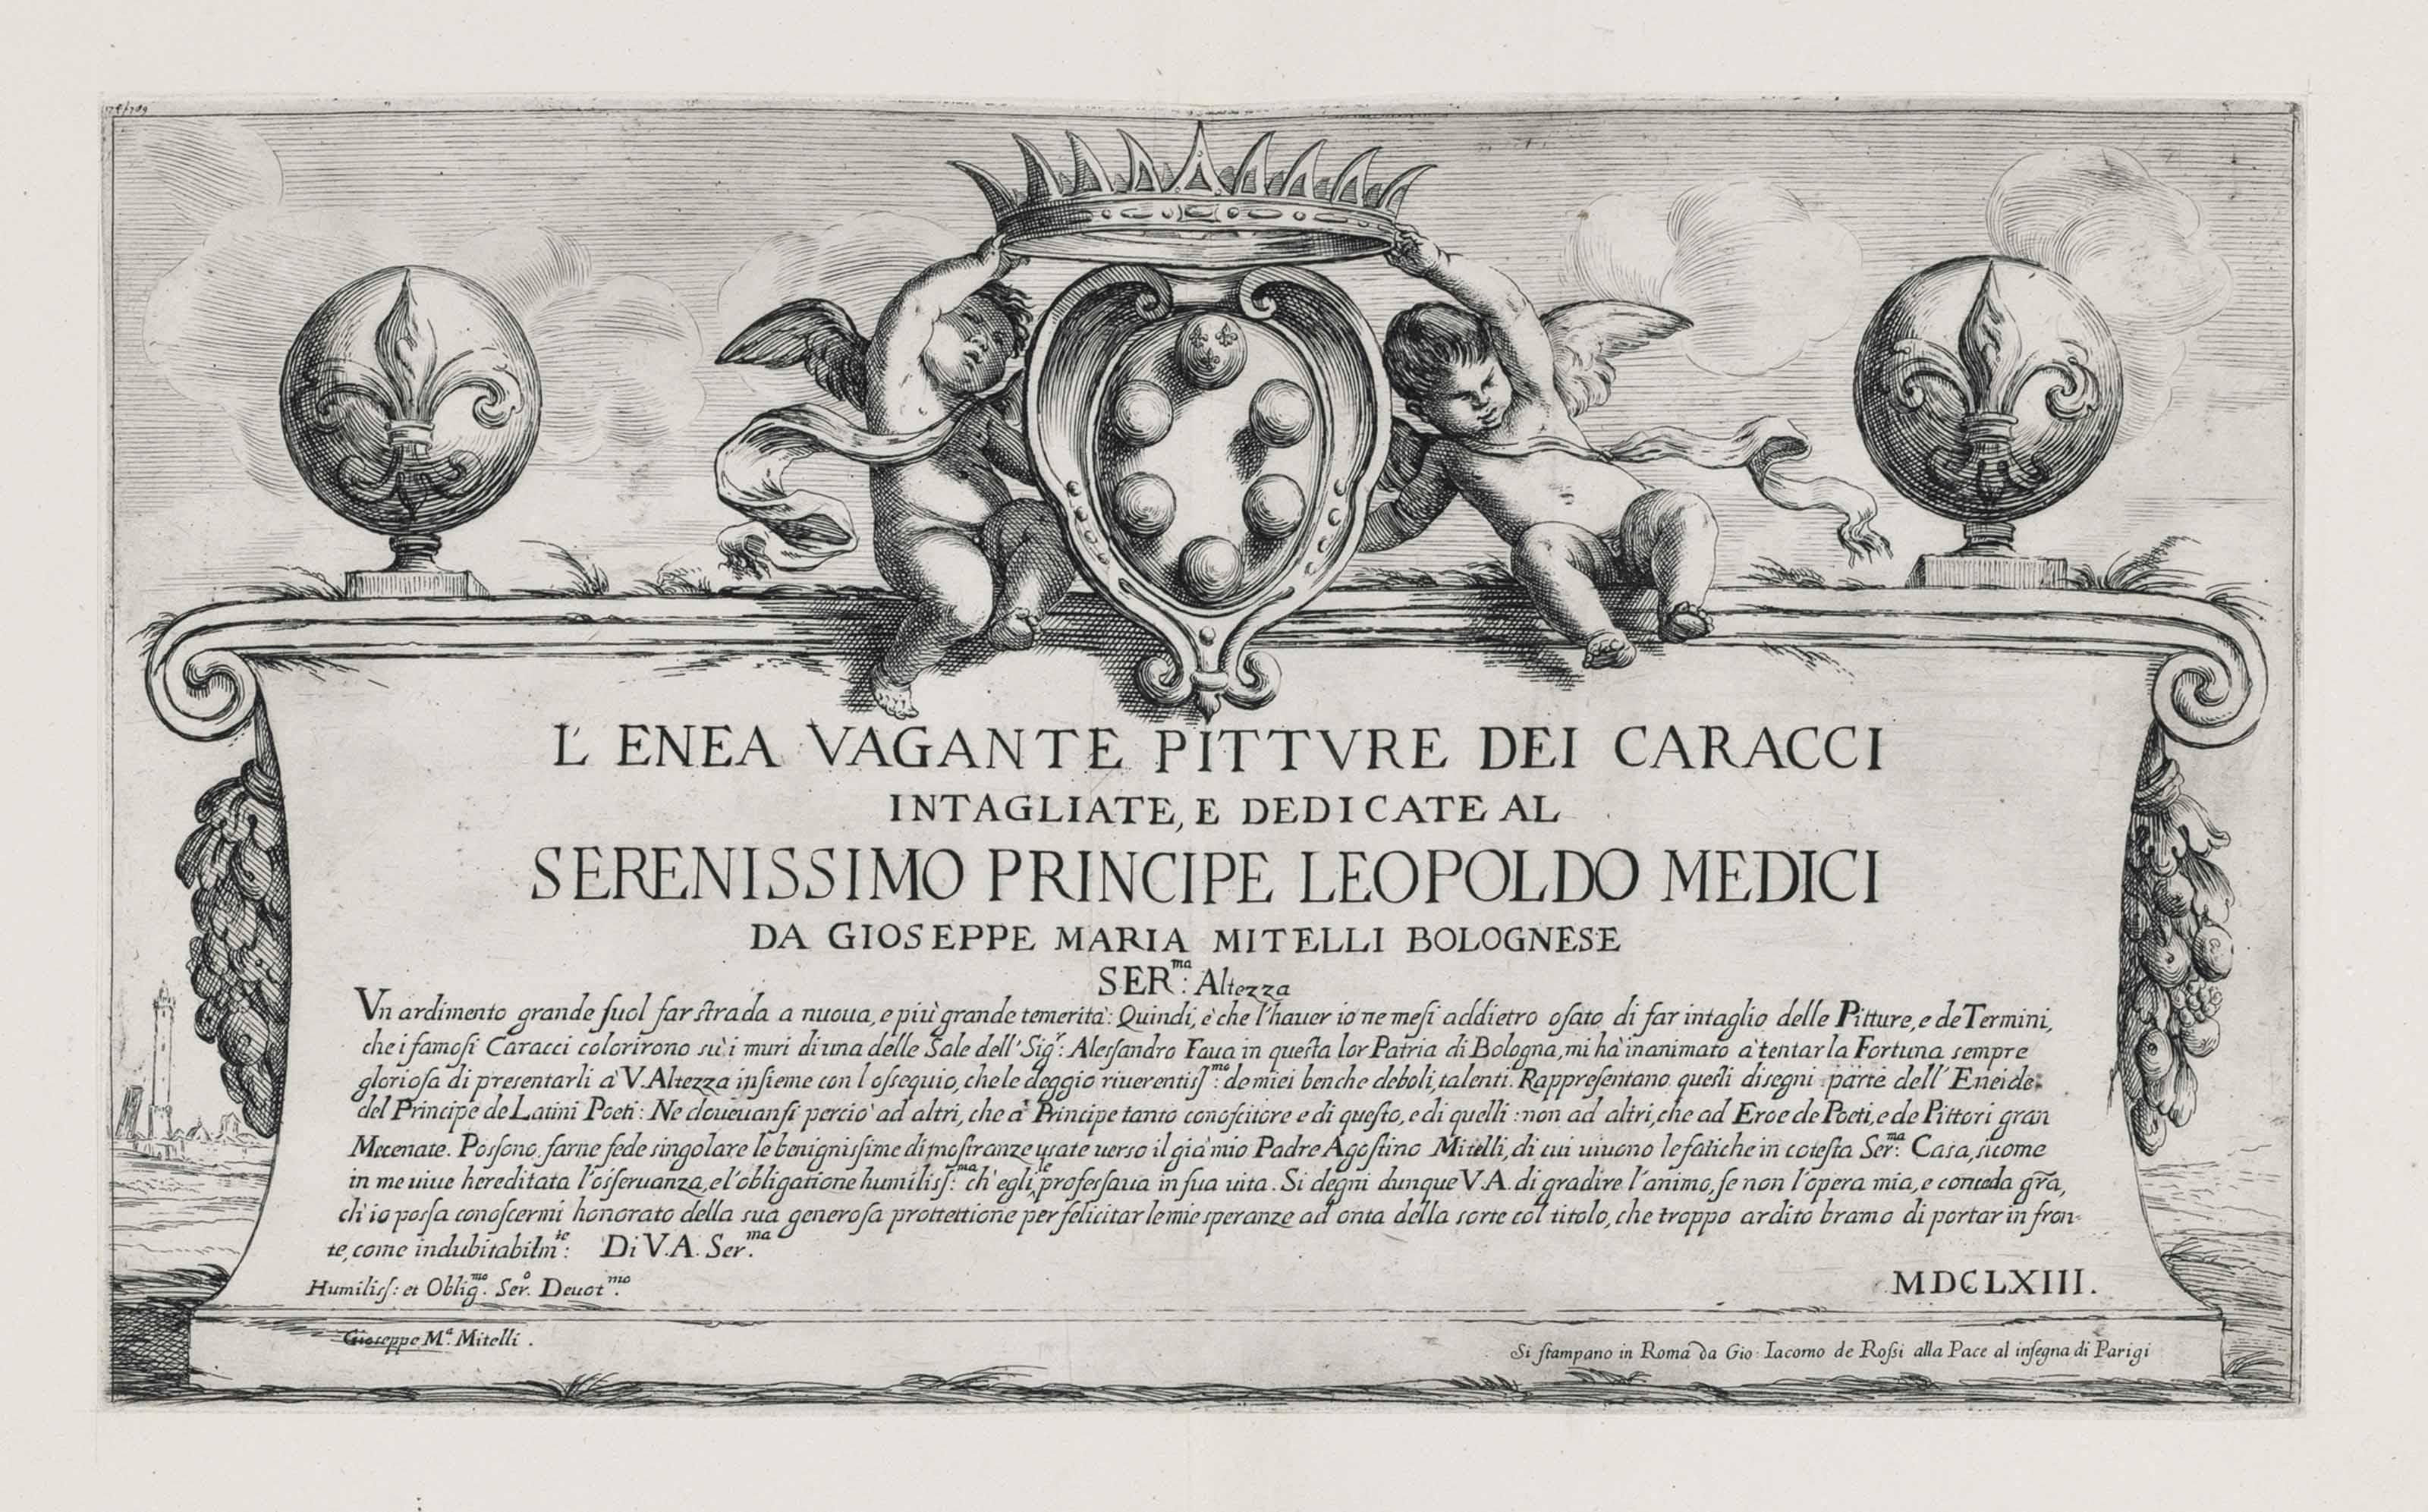 CARRACCI, Ludovico (1555 - 1619) and CARRACCI, Annibale (1560 - 1609) after, by Giuseppe Maria MITELLI (1634 - 1718)